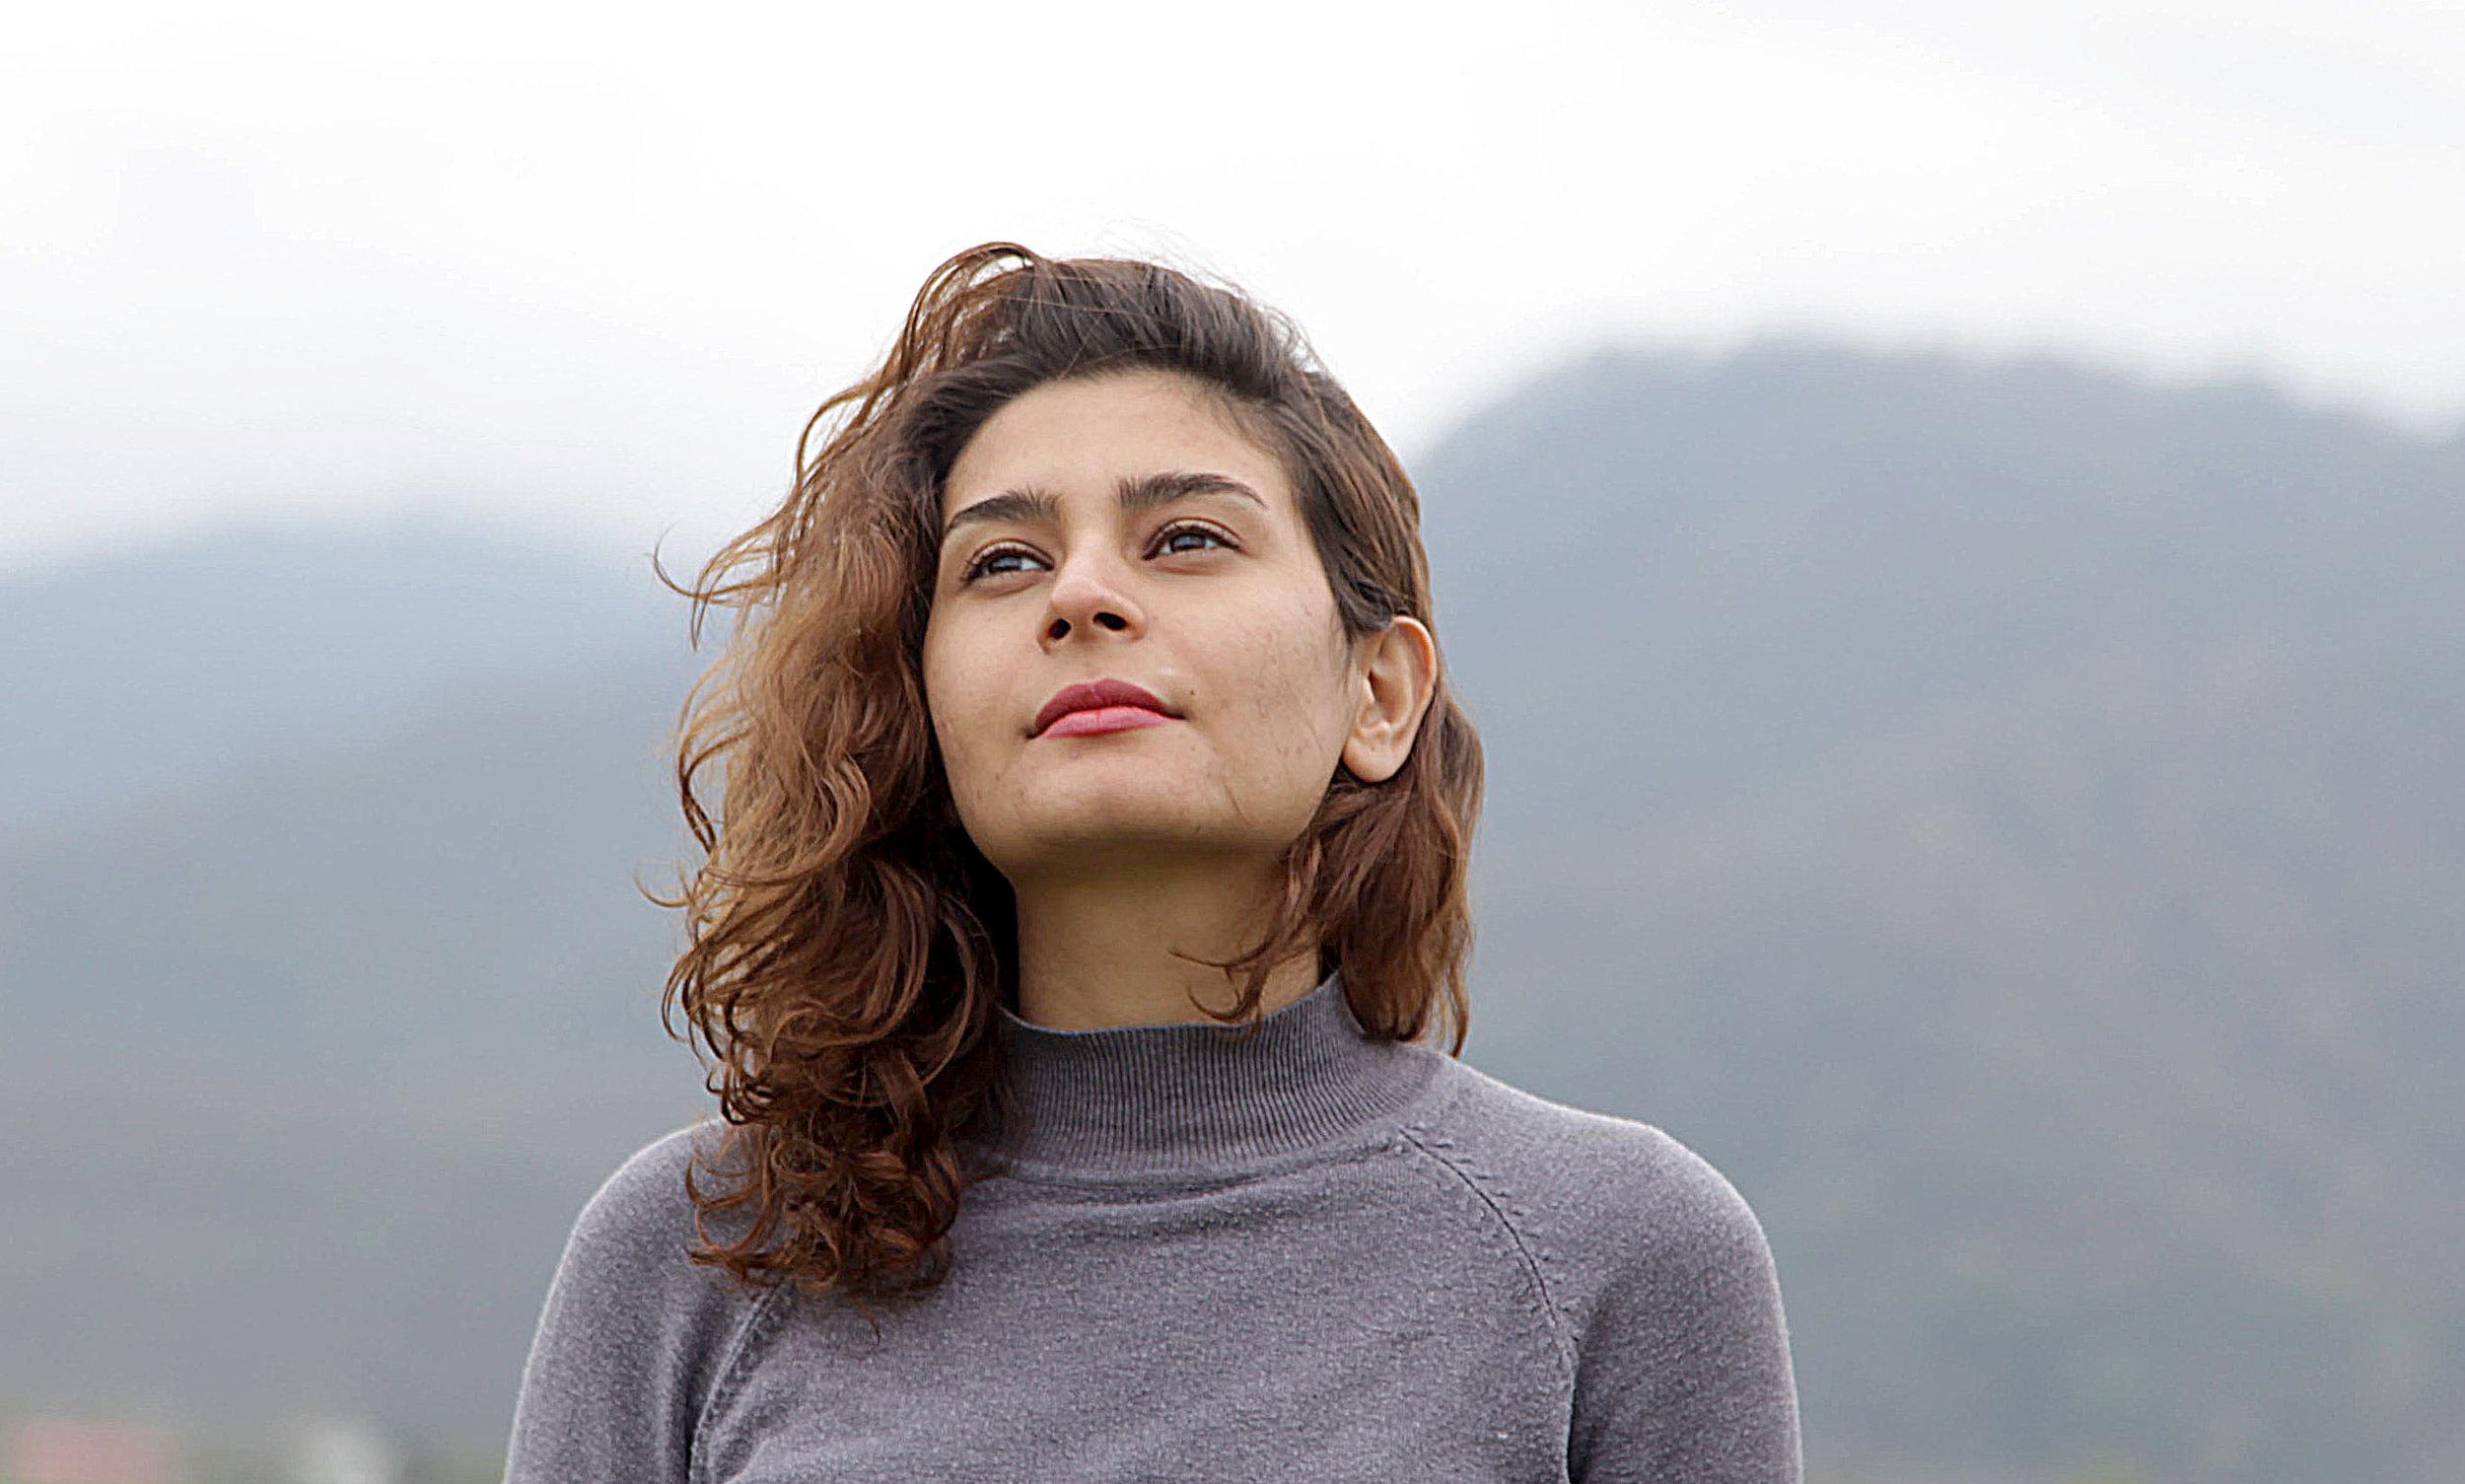 Farzane Ghadyanloo